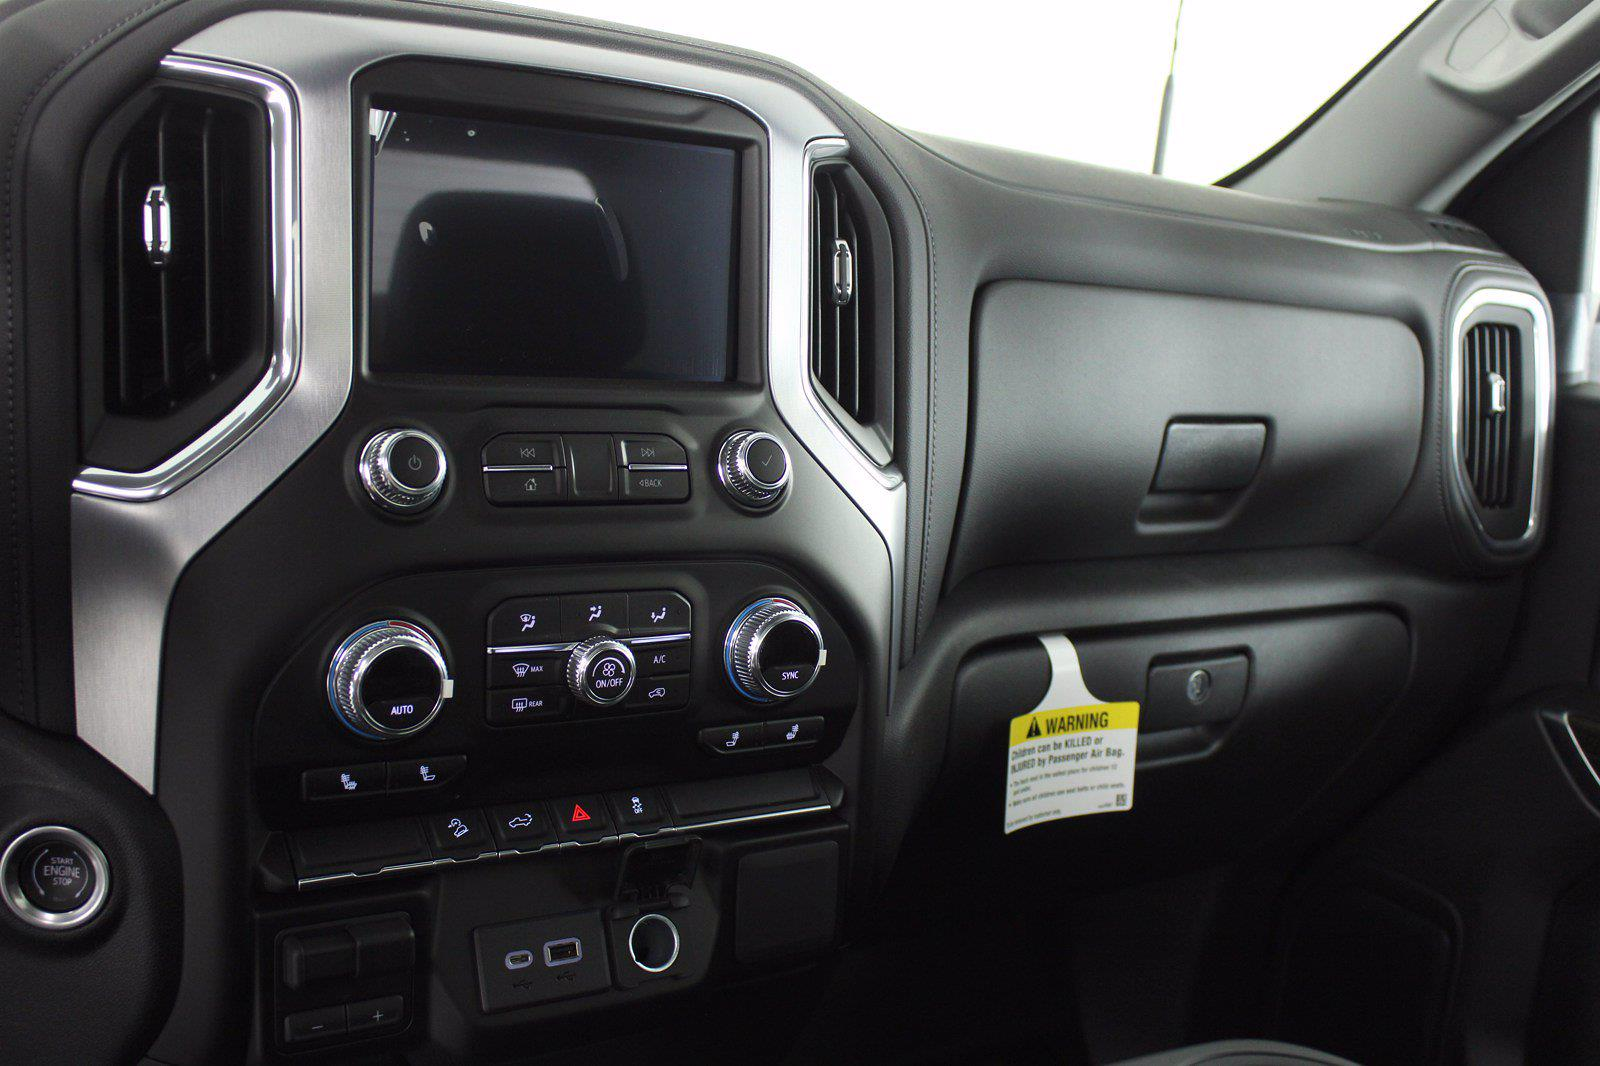 2022 Sierra 2500 Regular Cab 4x4,  Pickup #D420038 - photo 12